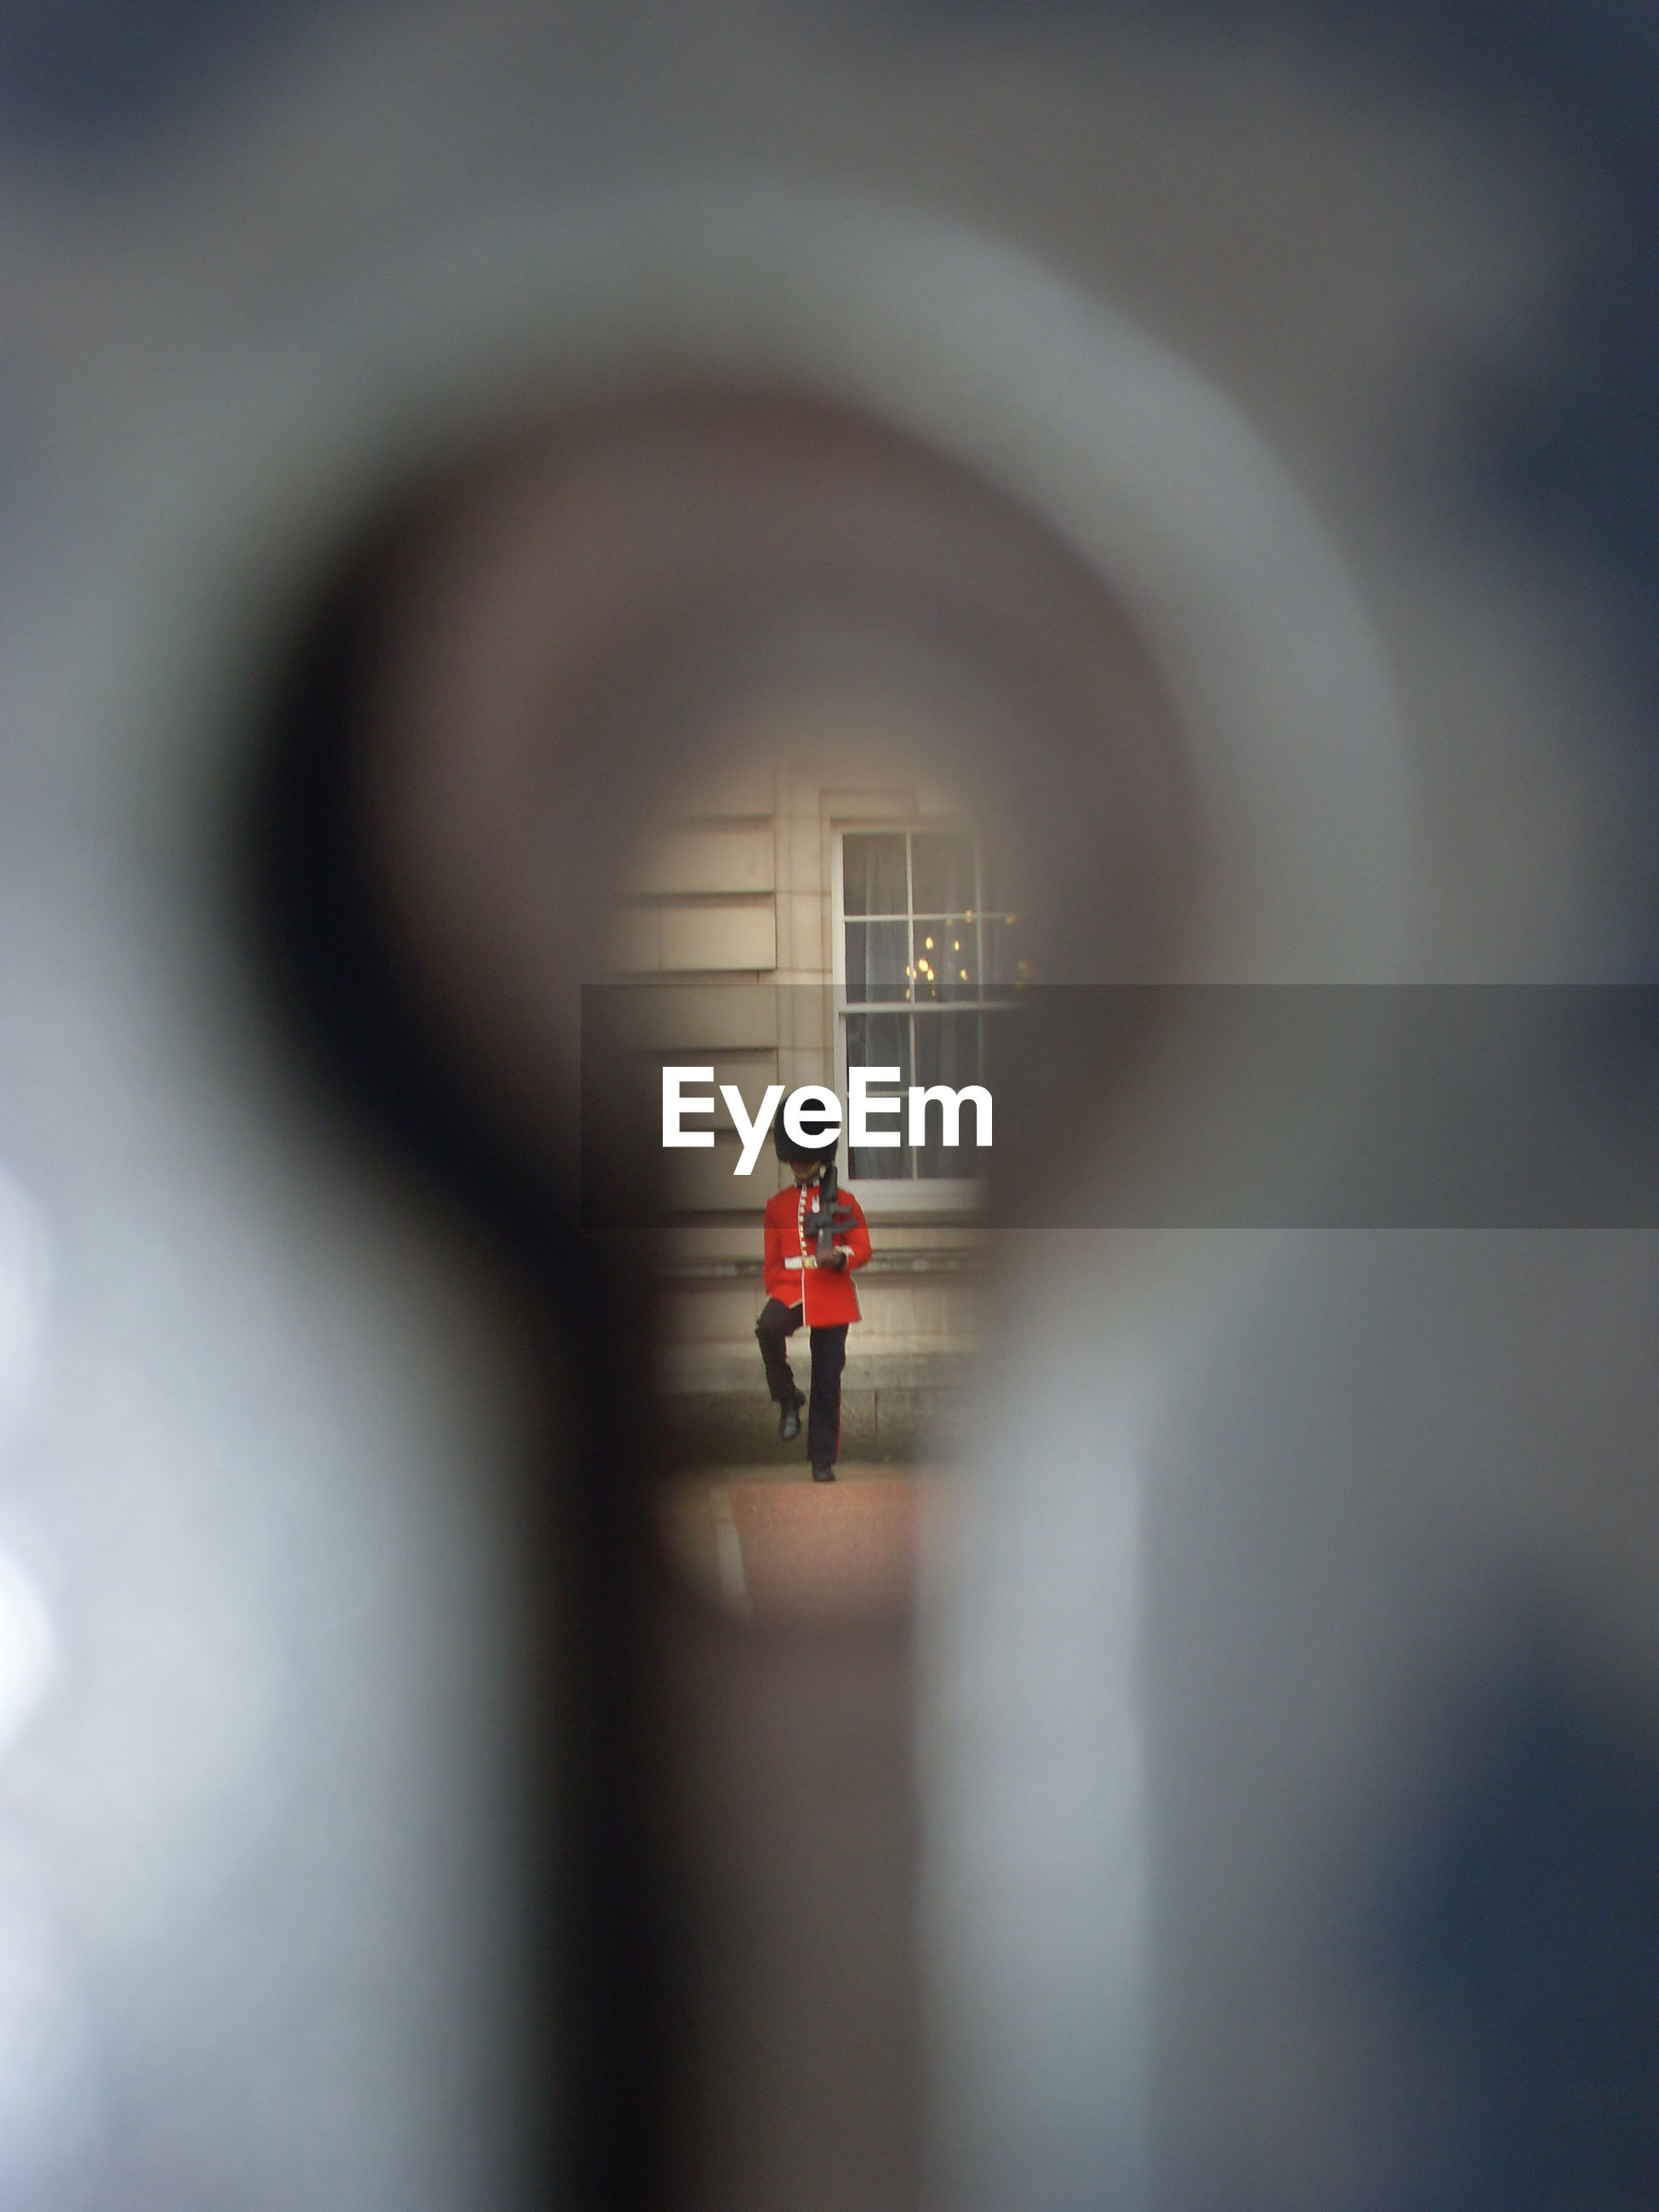 Army solder seen through key hole at buckingham palace